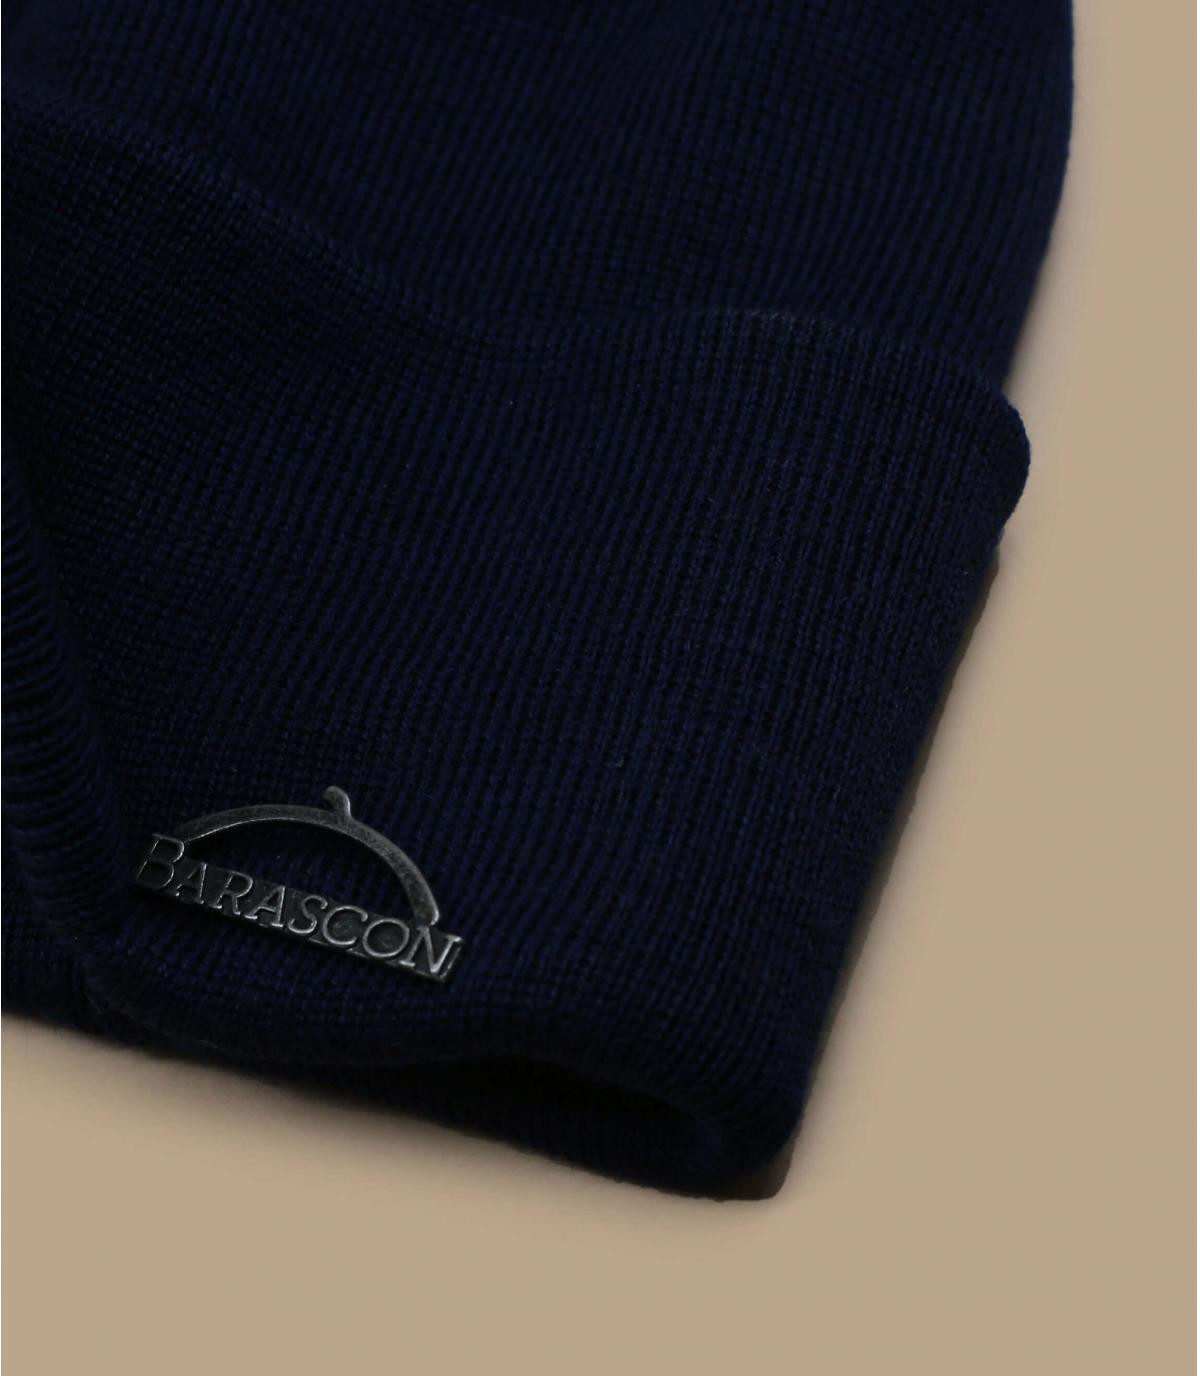 Details Barascon Beanie Wool Acryl navy - afbeeling 2